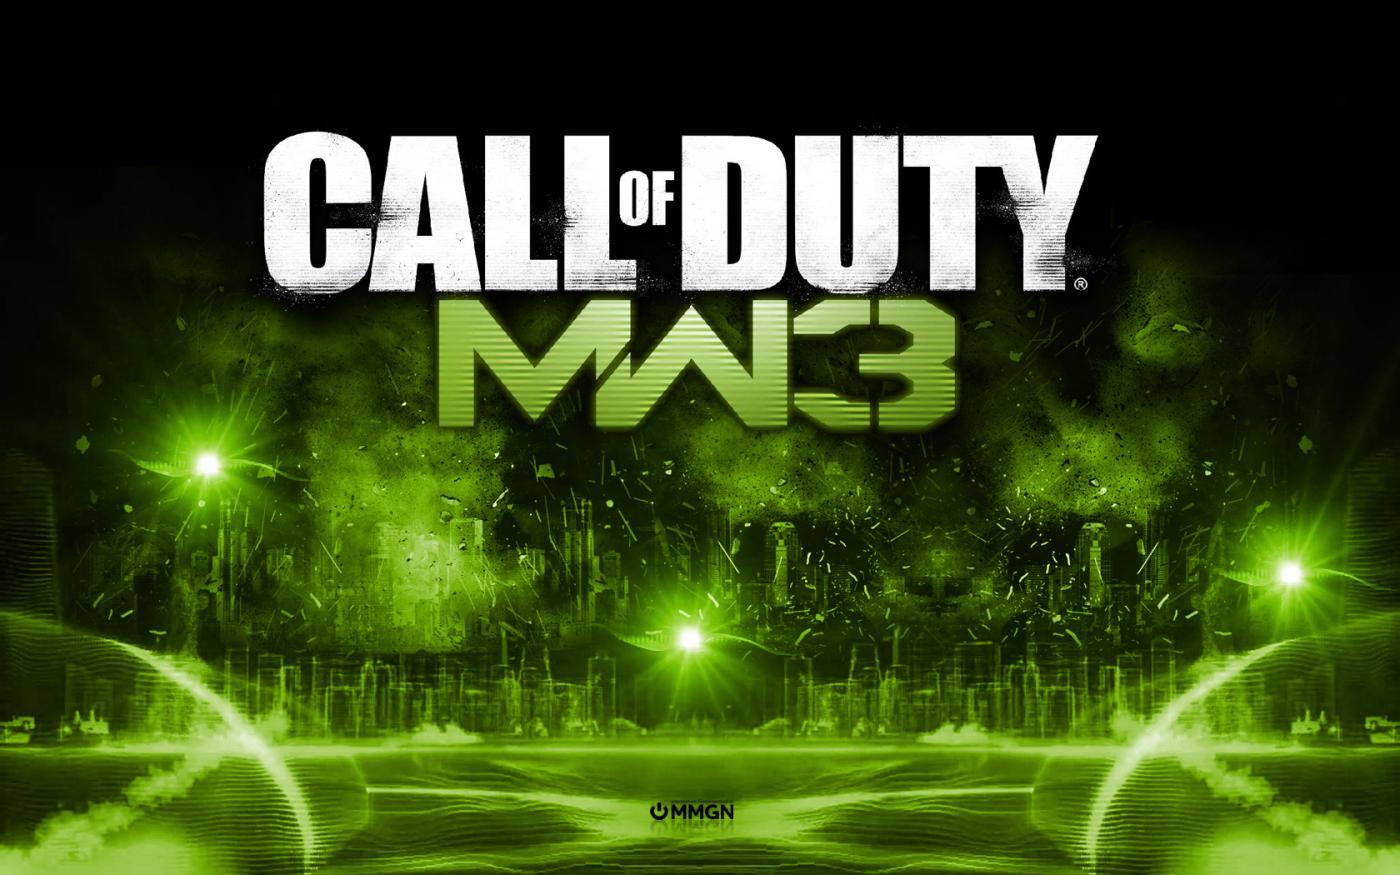 76676776cod_mw3_Call_Of_Duty_Modern_Warfare_new_topic_convert_20121015153852.jpg